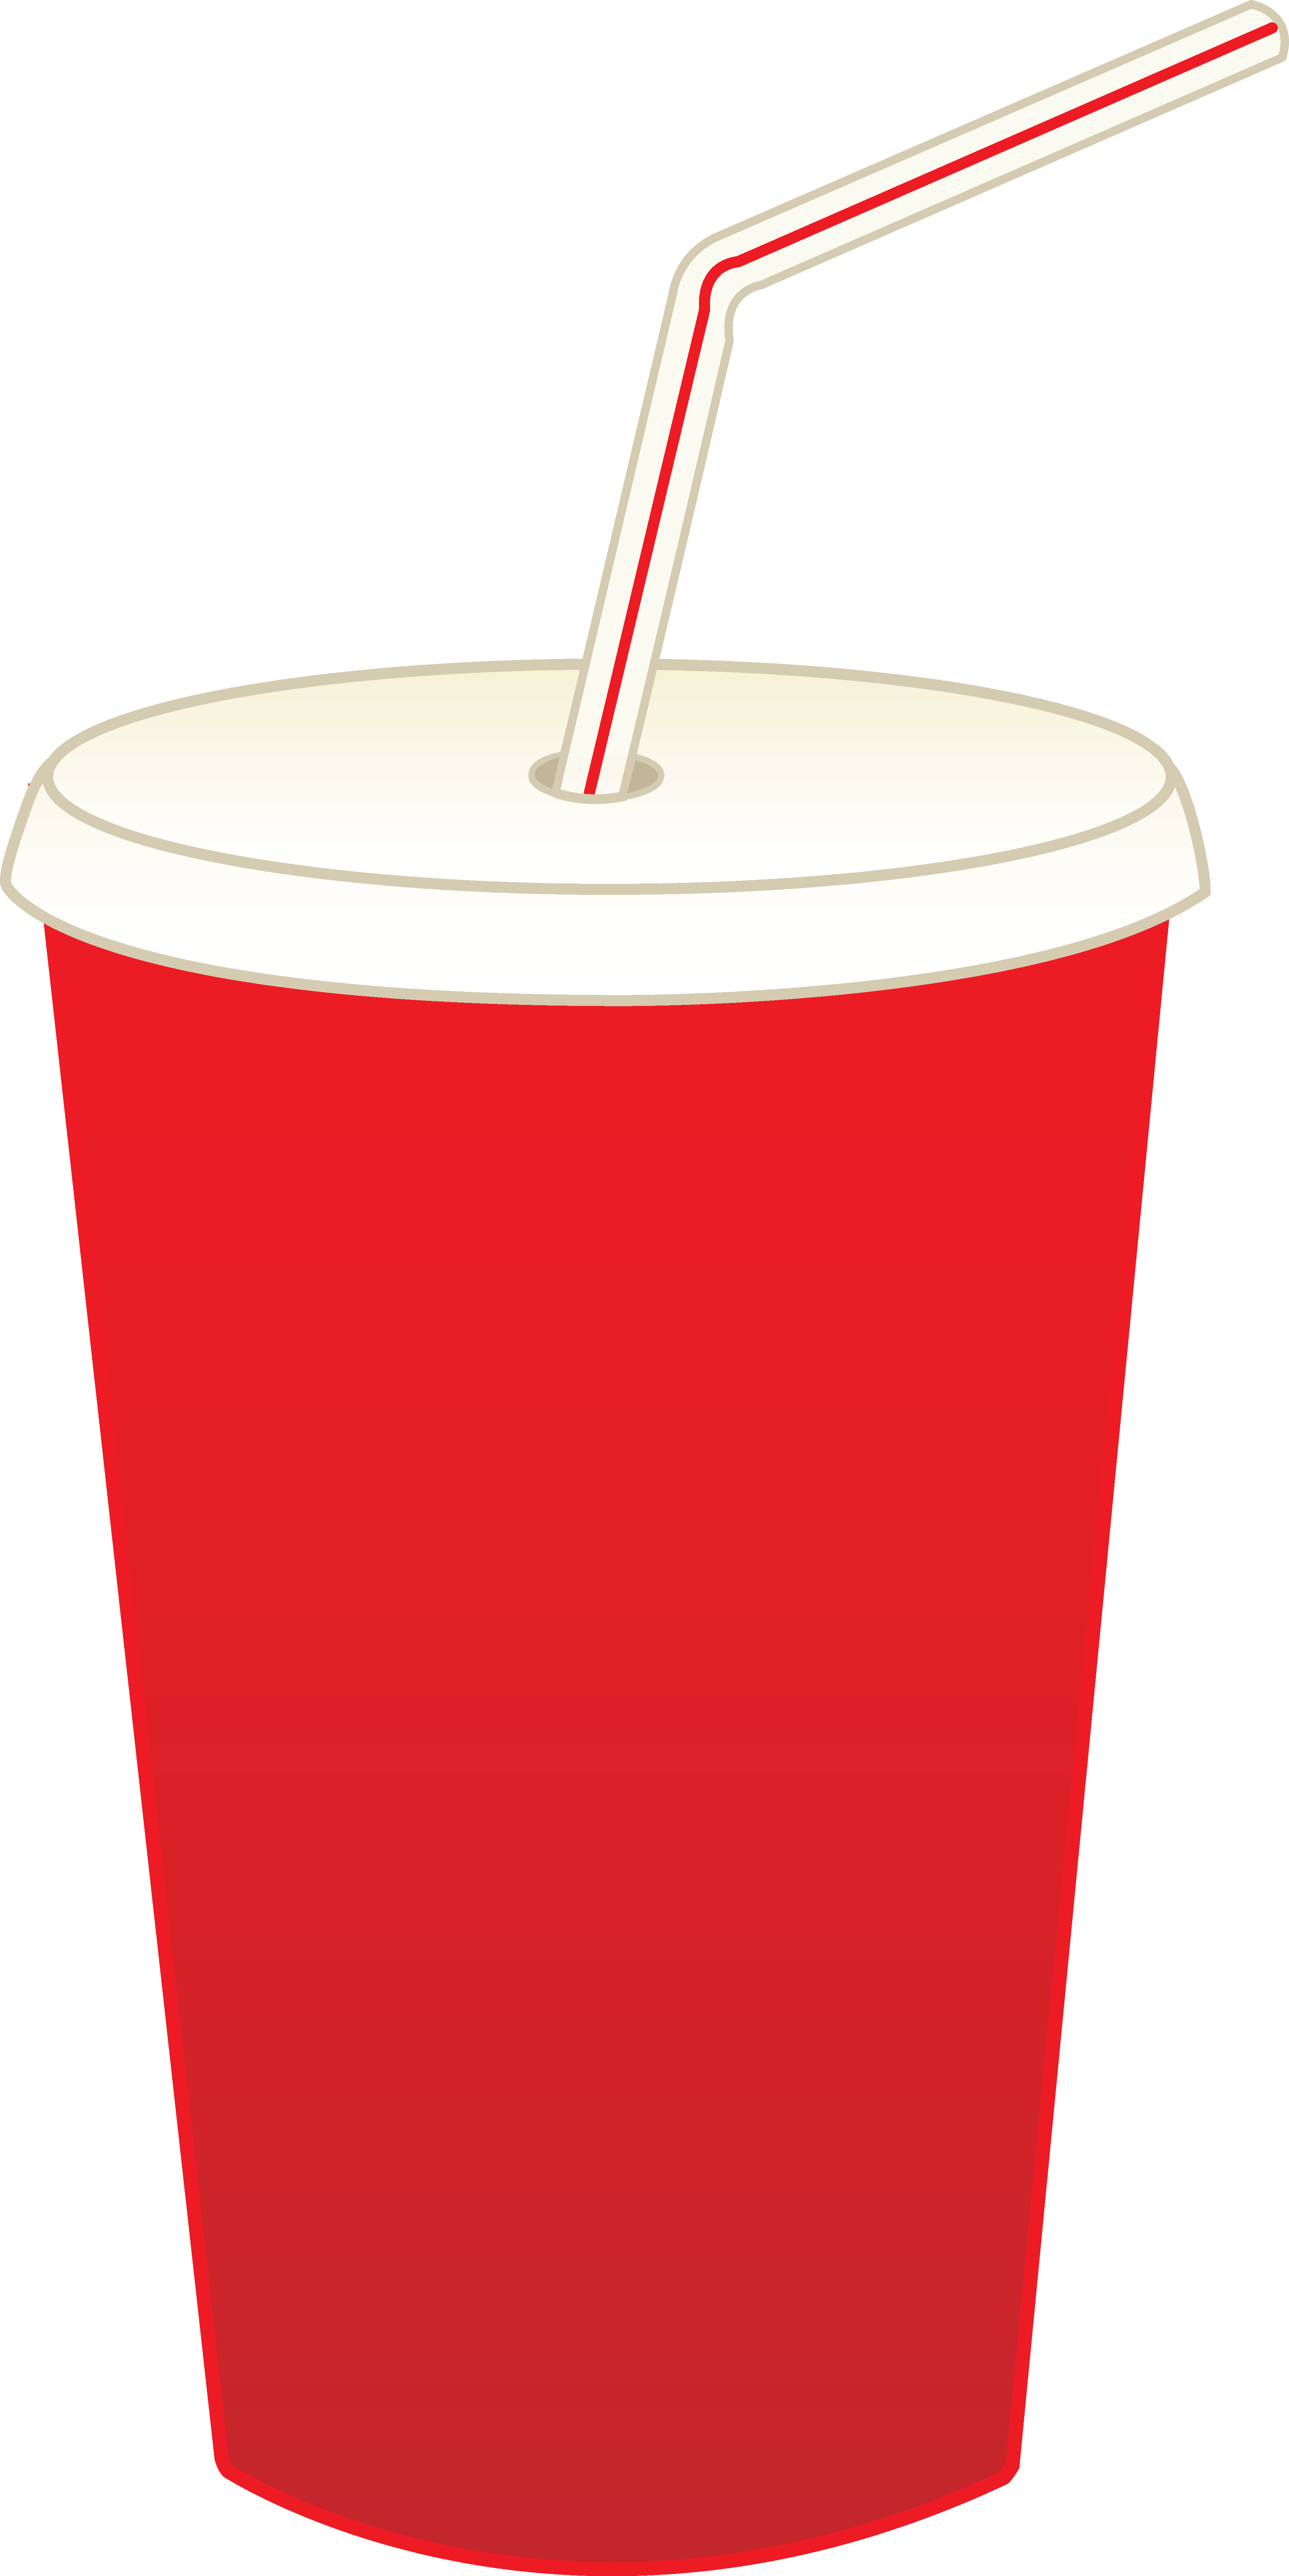 - Soda Clipart